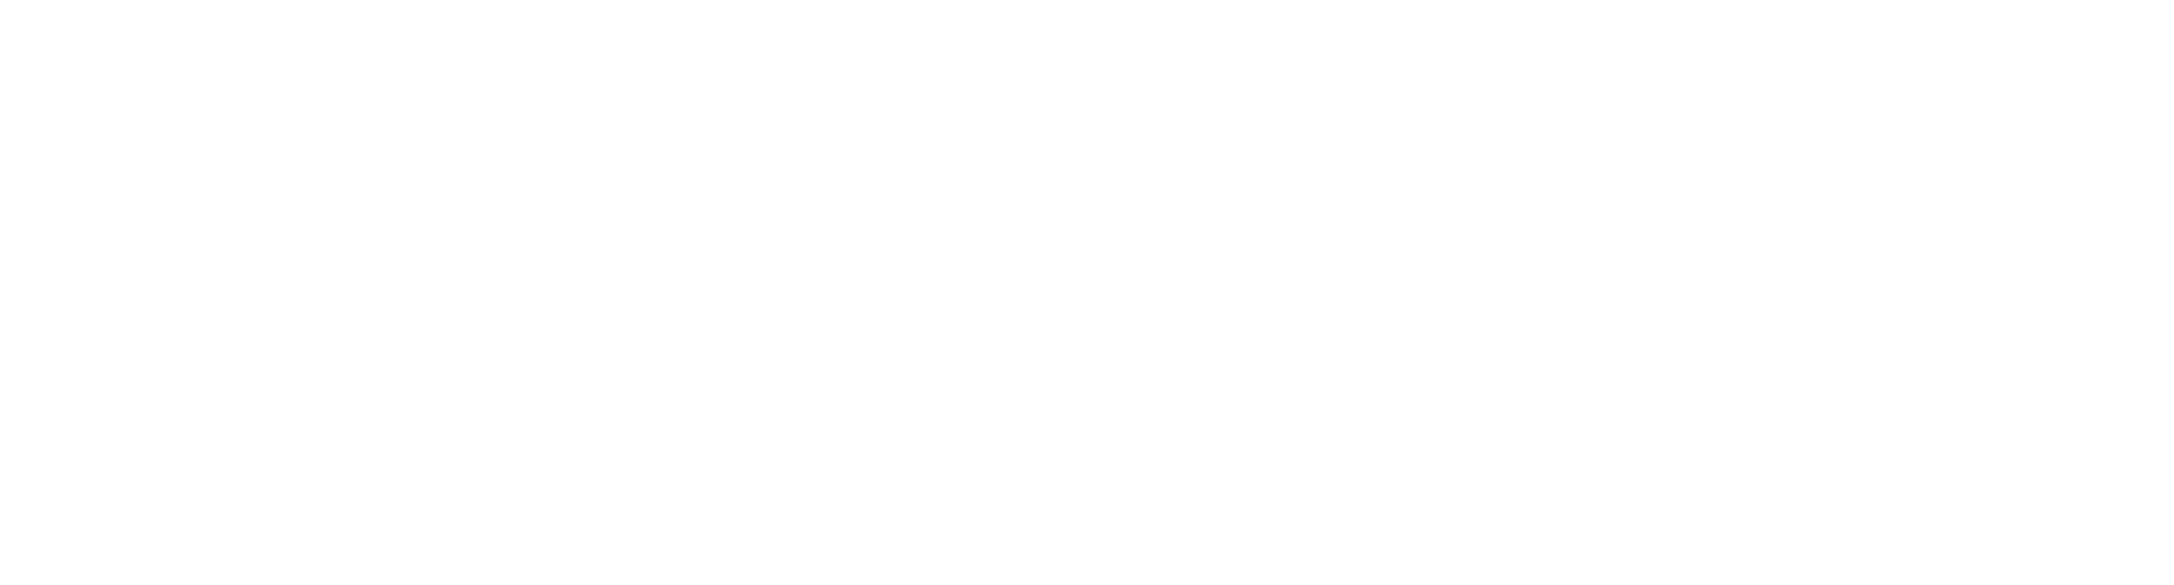 Viewpoints Radio